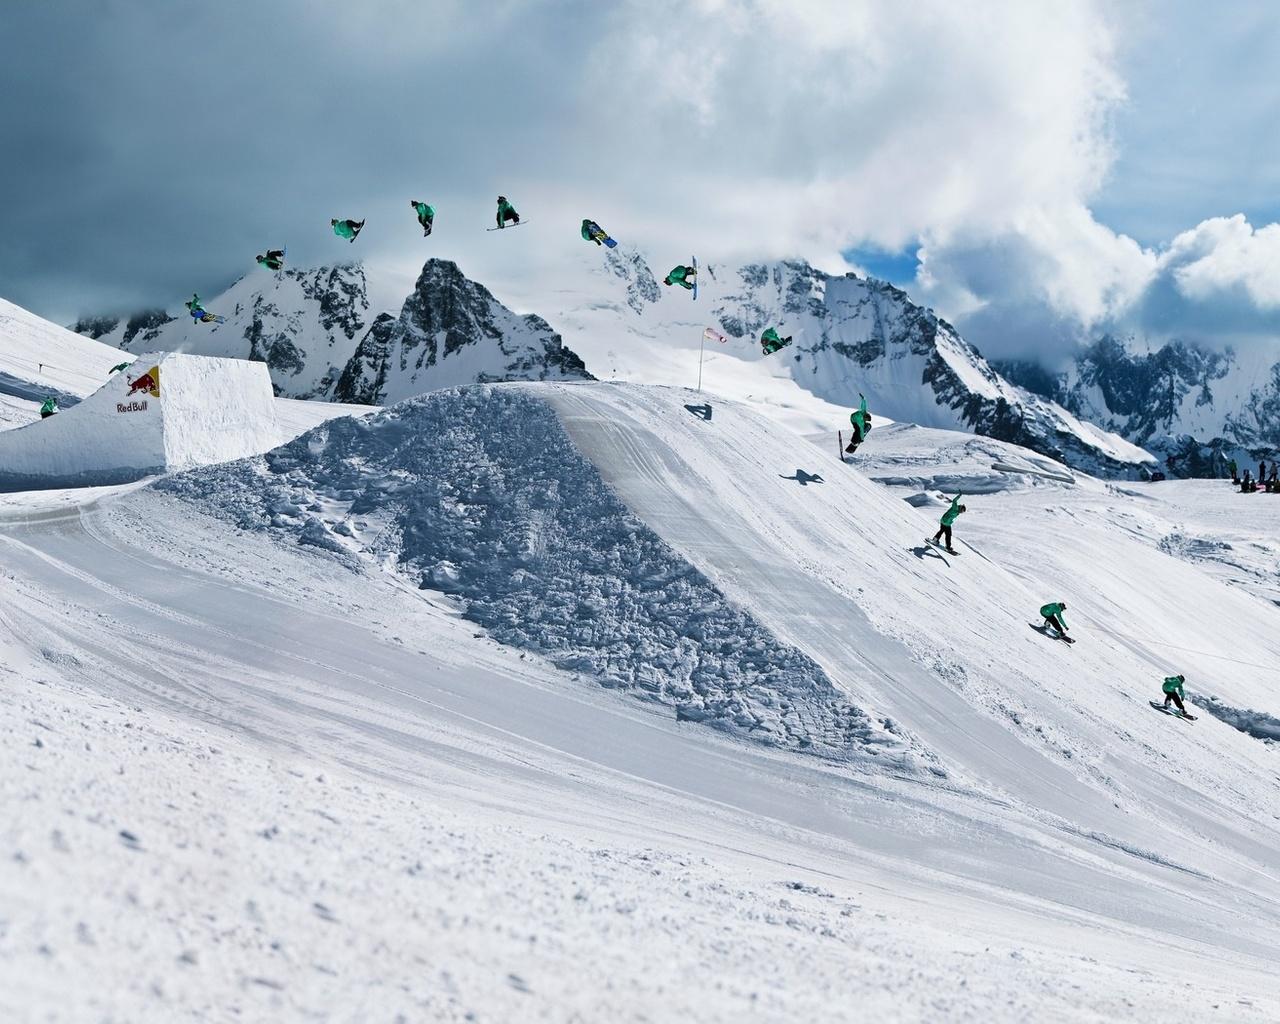 Спорт зимние сноуборд red bull трюк обои